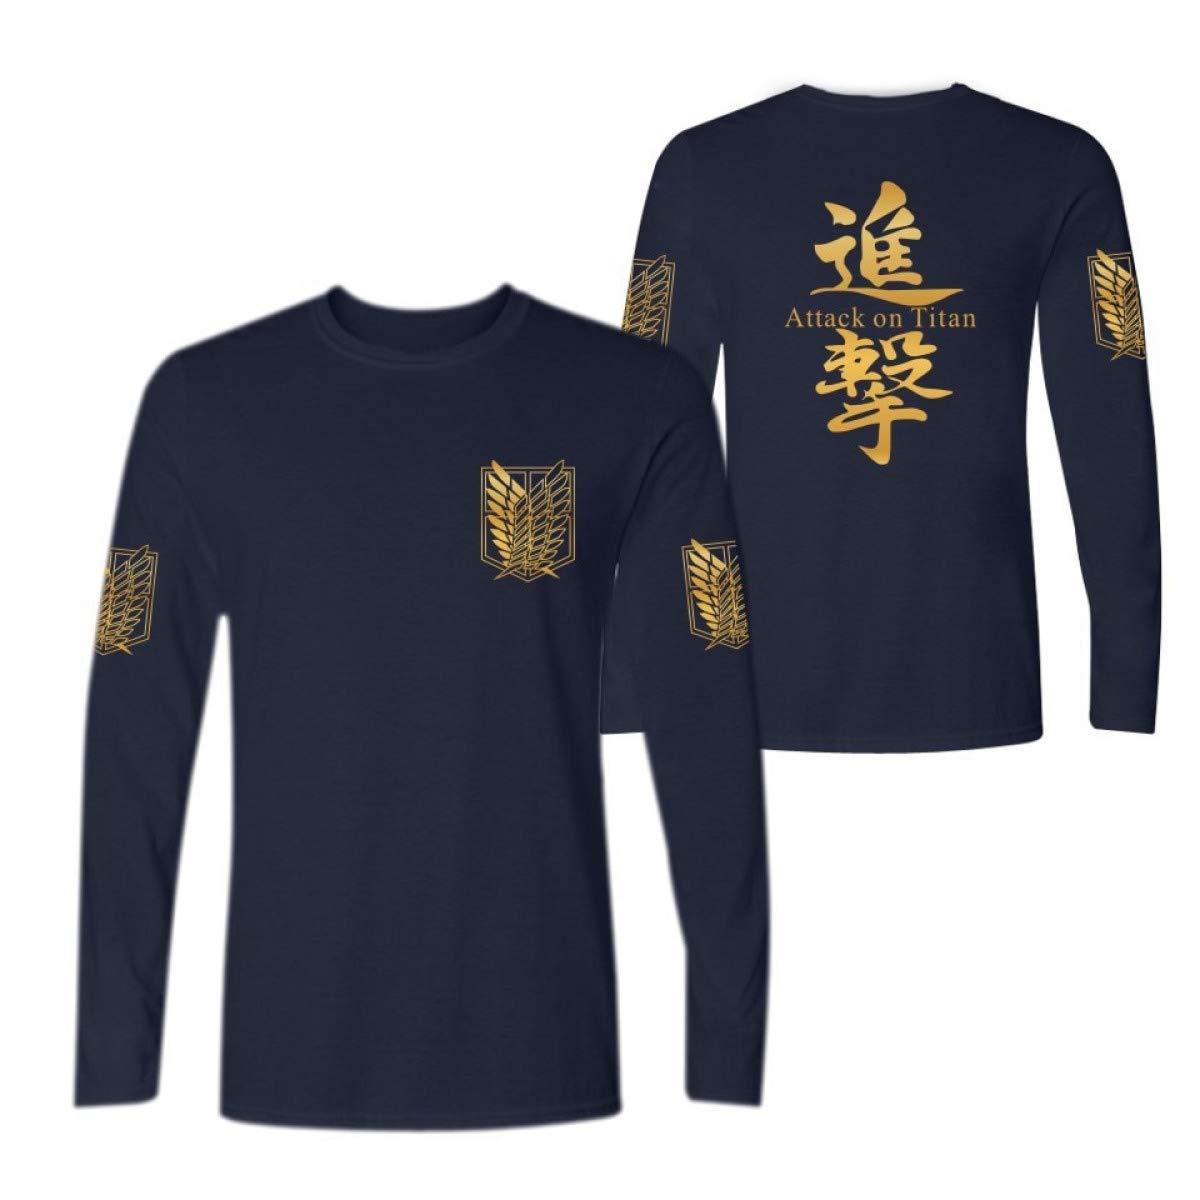 Flamenco Anime Attack on Titan Long Sleeve T Shirt Men Women ...